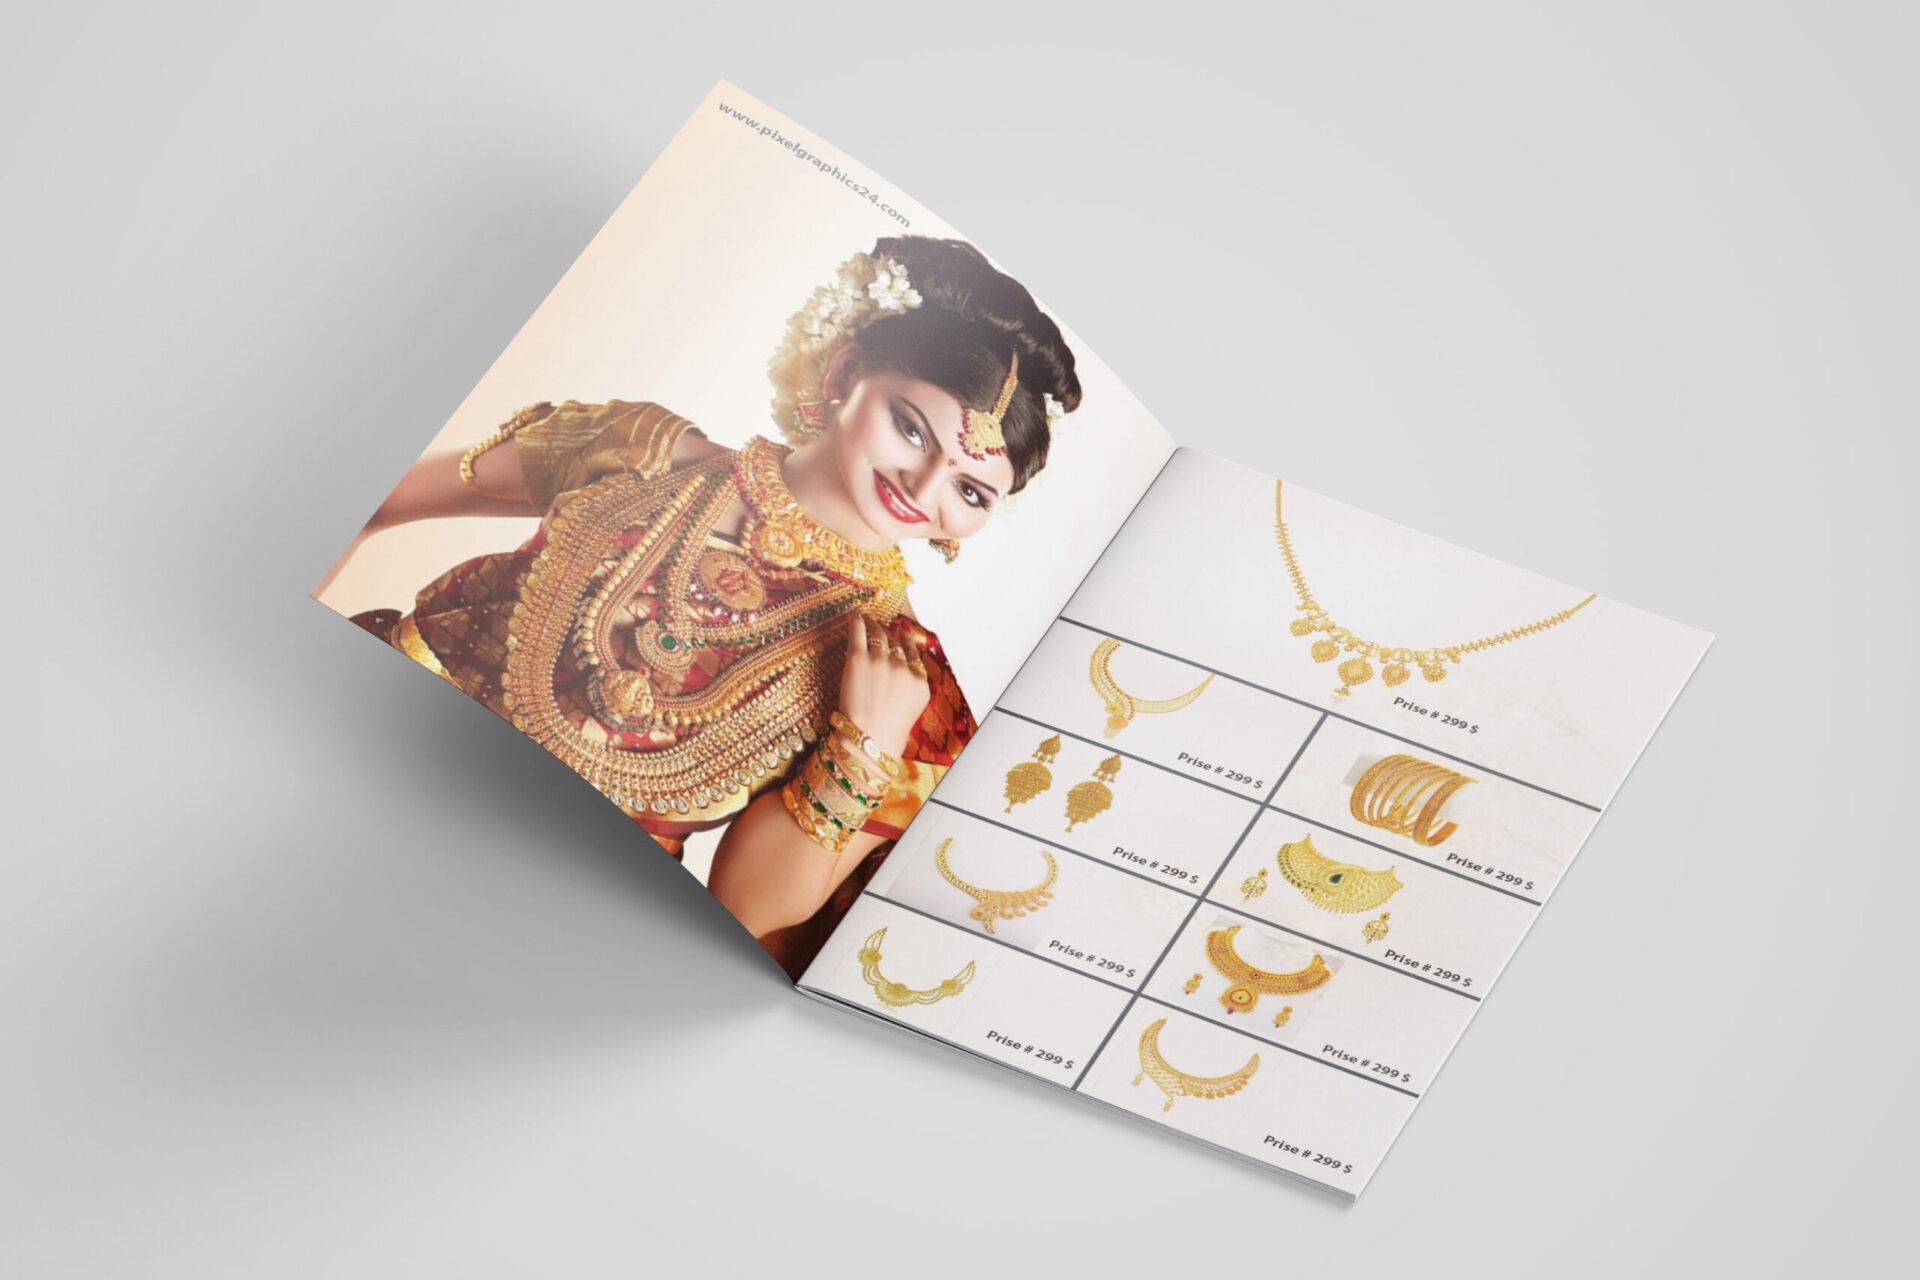 Catalog Design || Clipping Path Services || Photo Editing Services || Image Editing Services